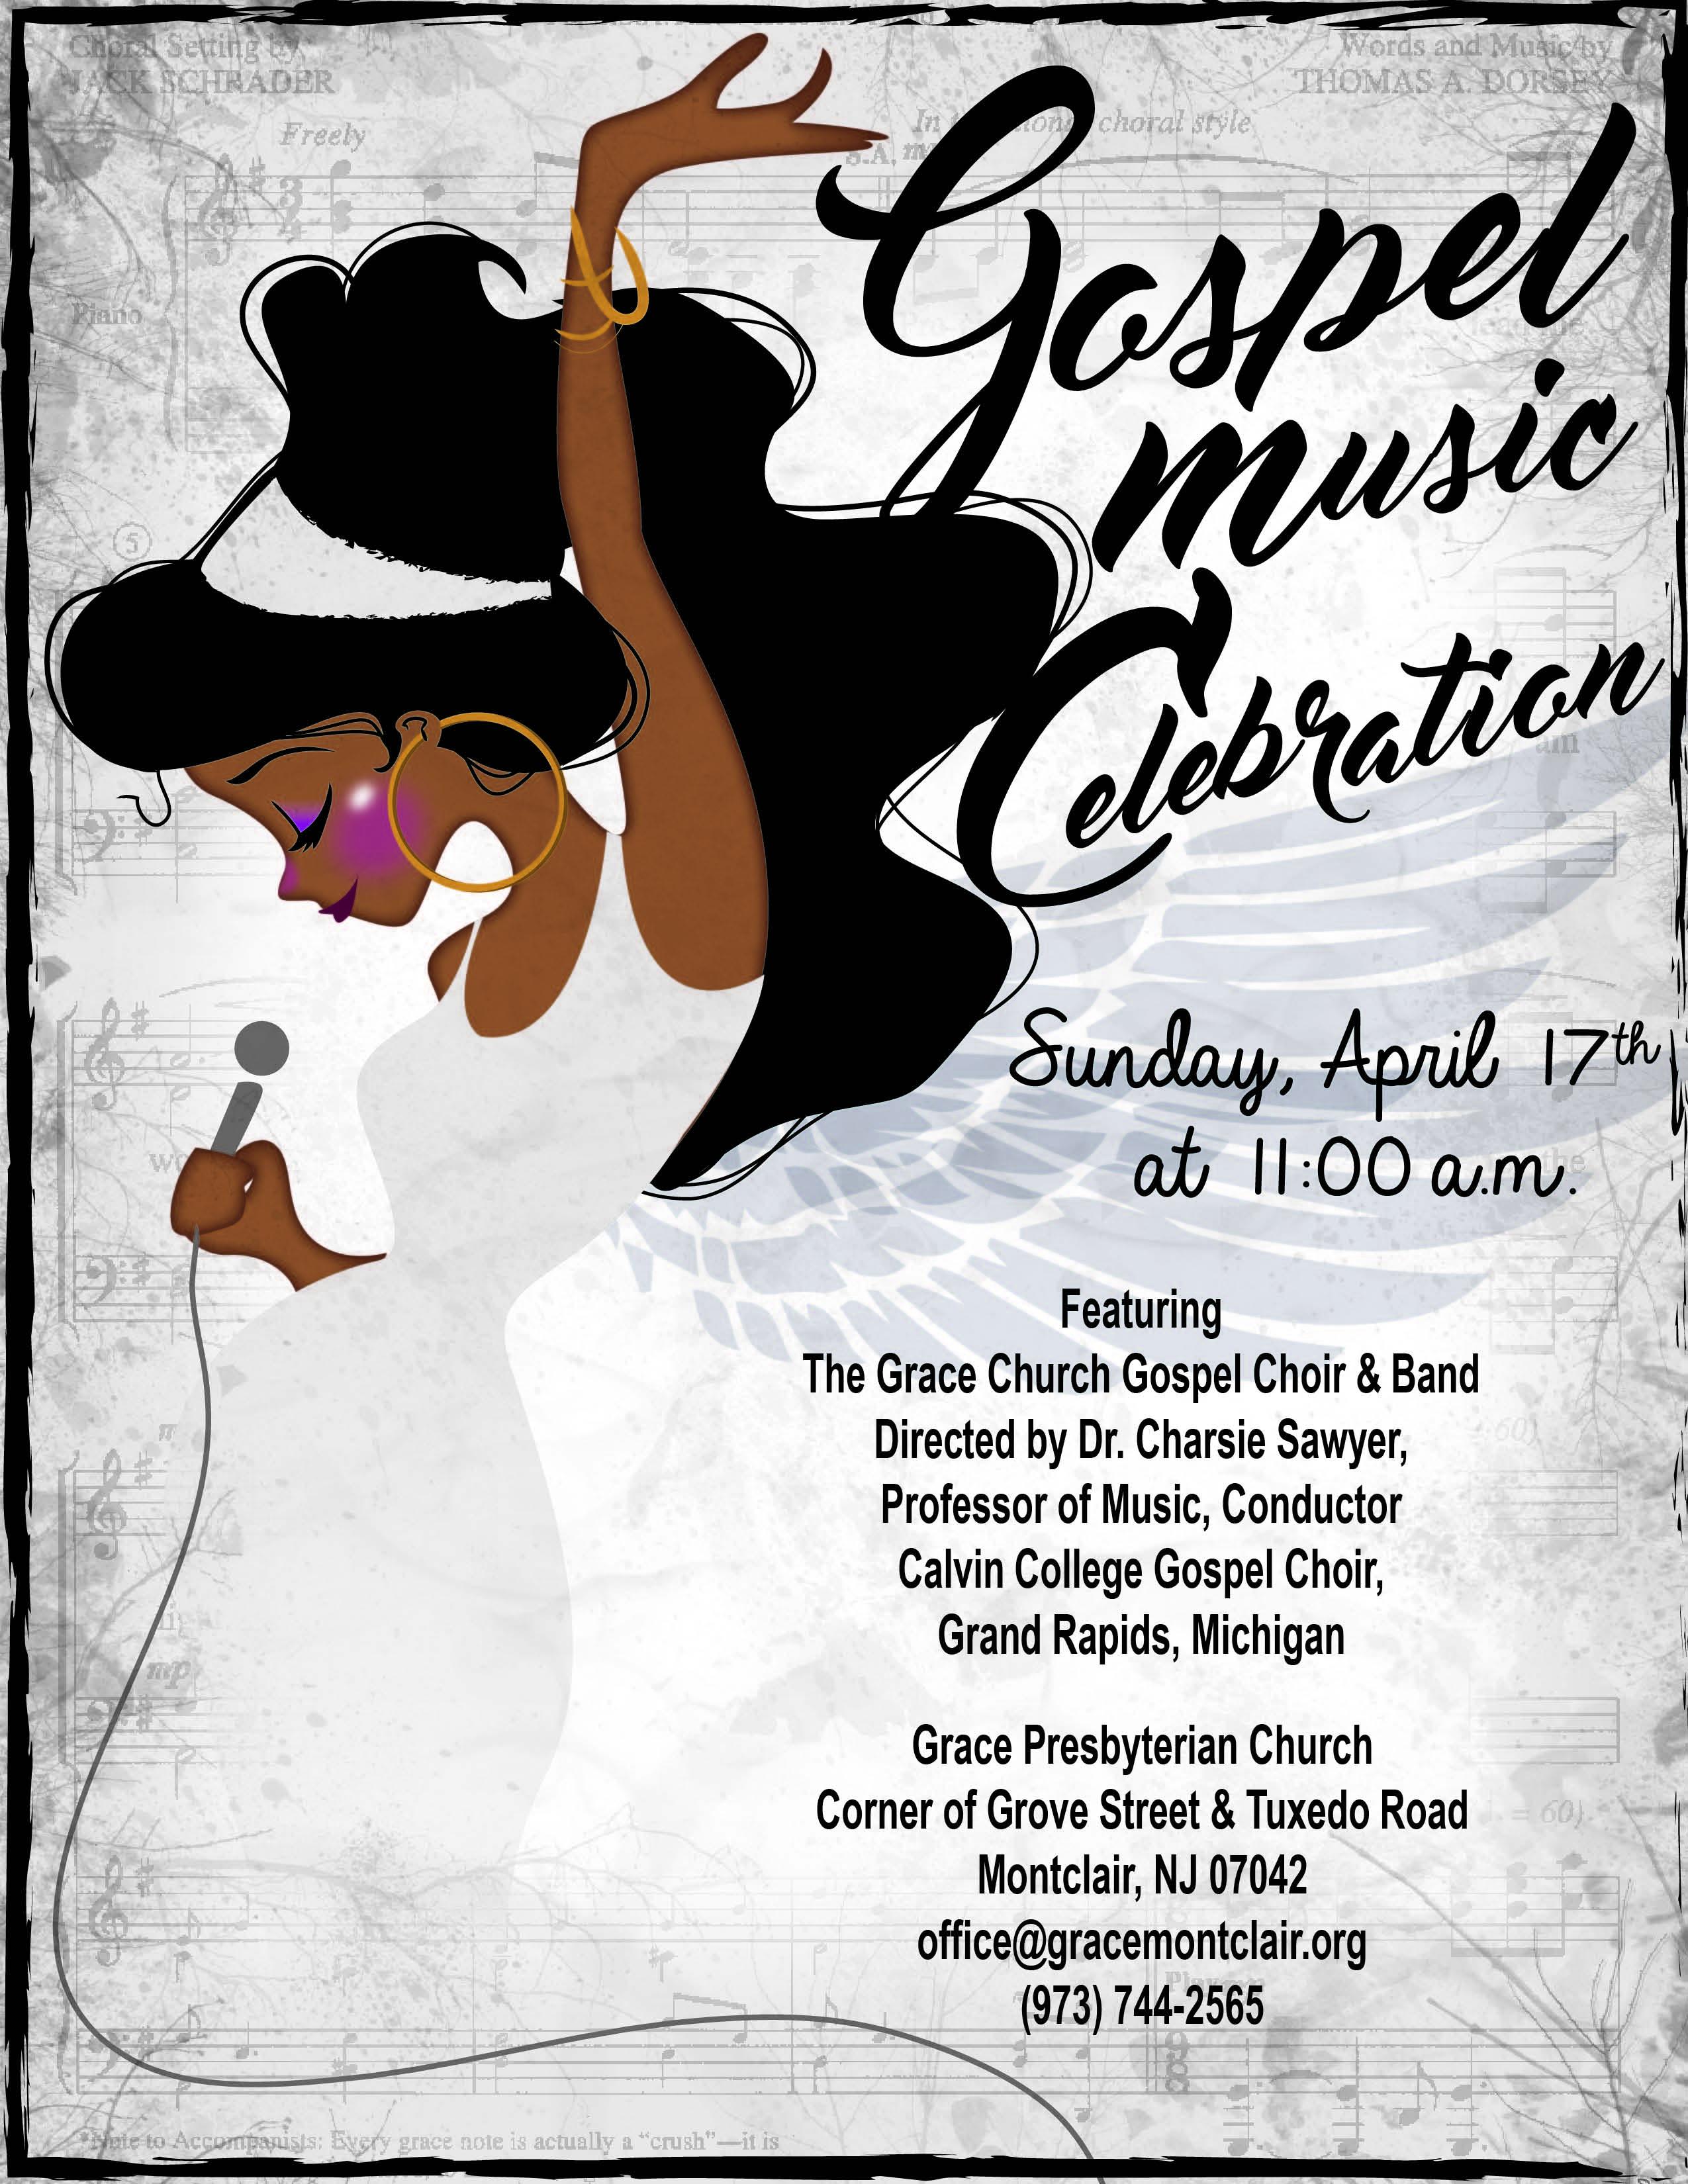 Grace Church Gospel Music Celebration   Baristanet